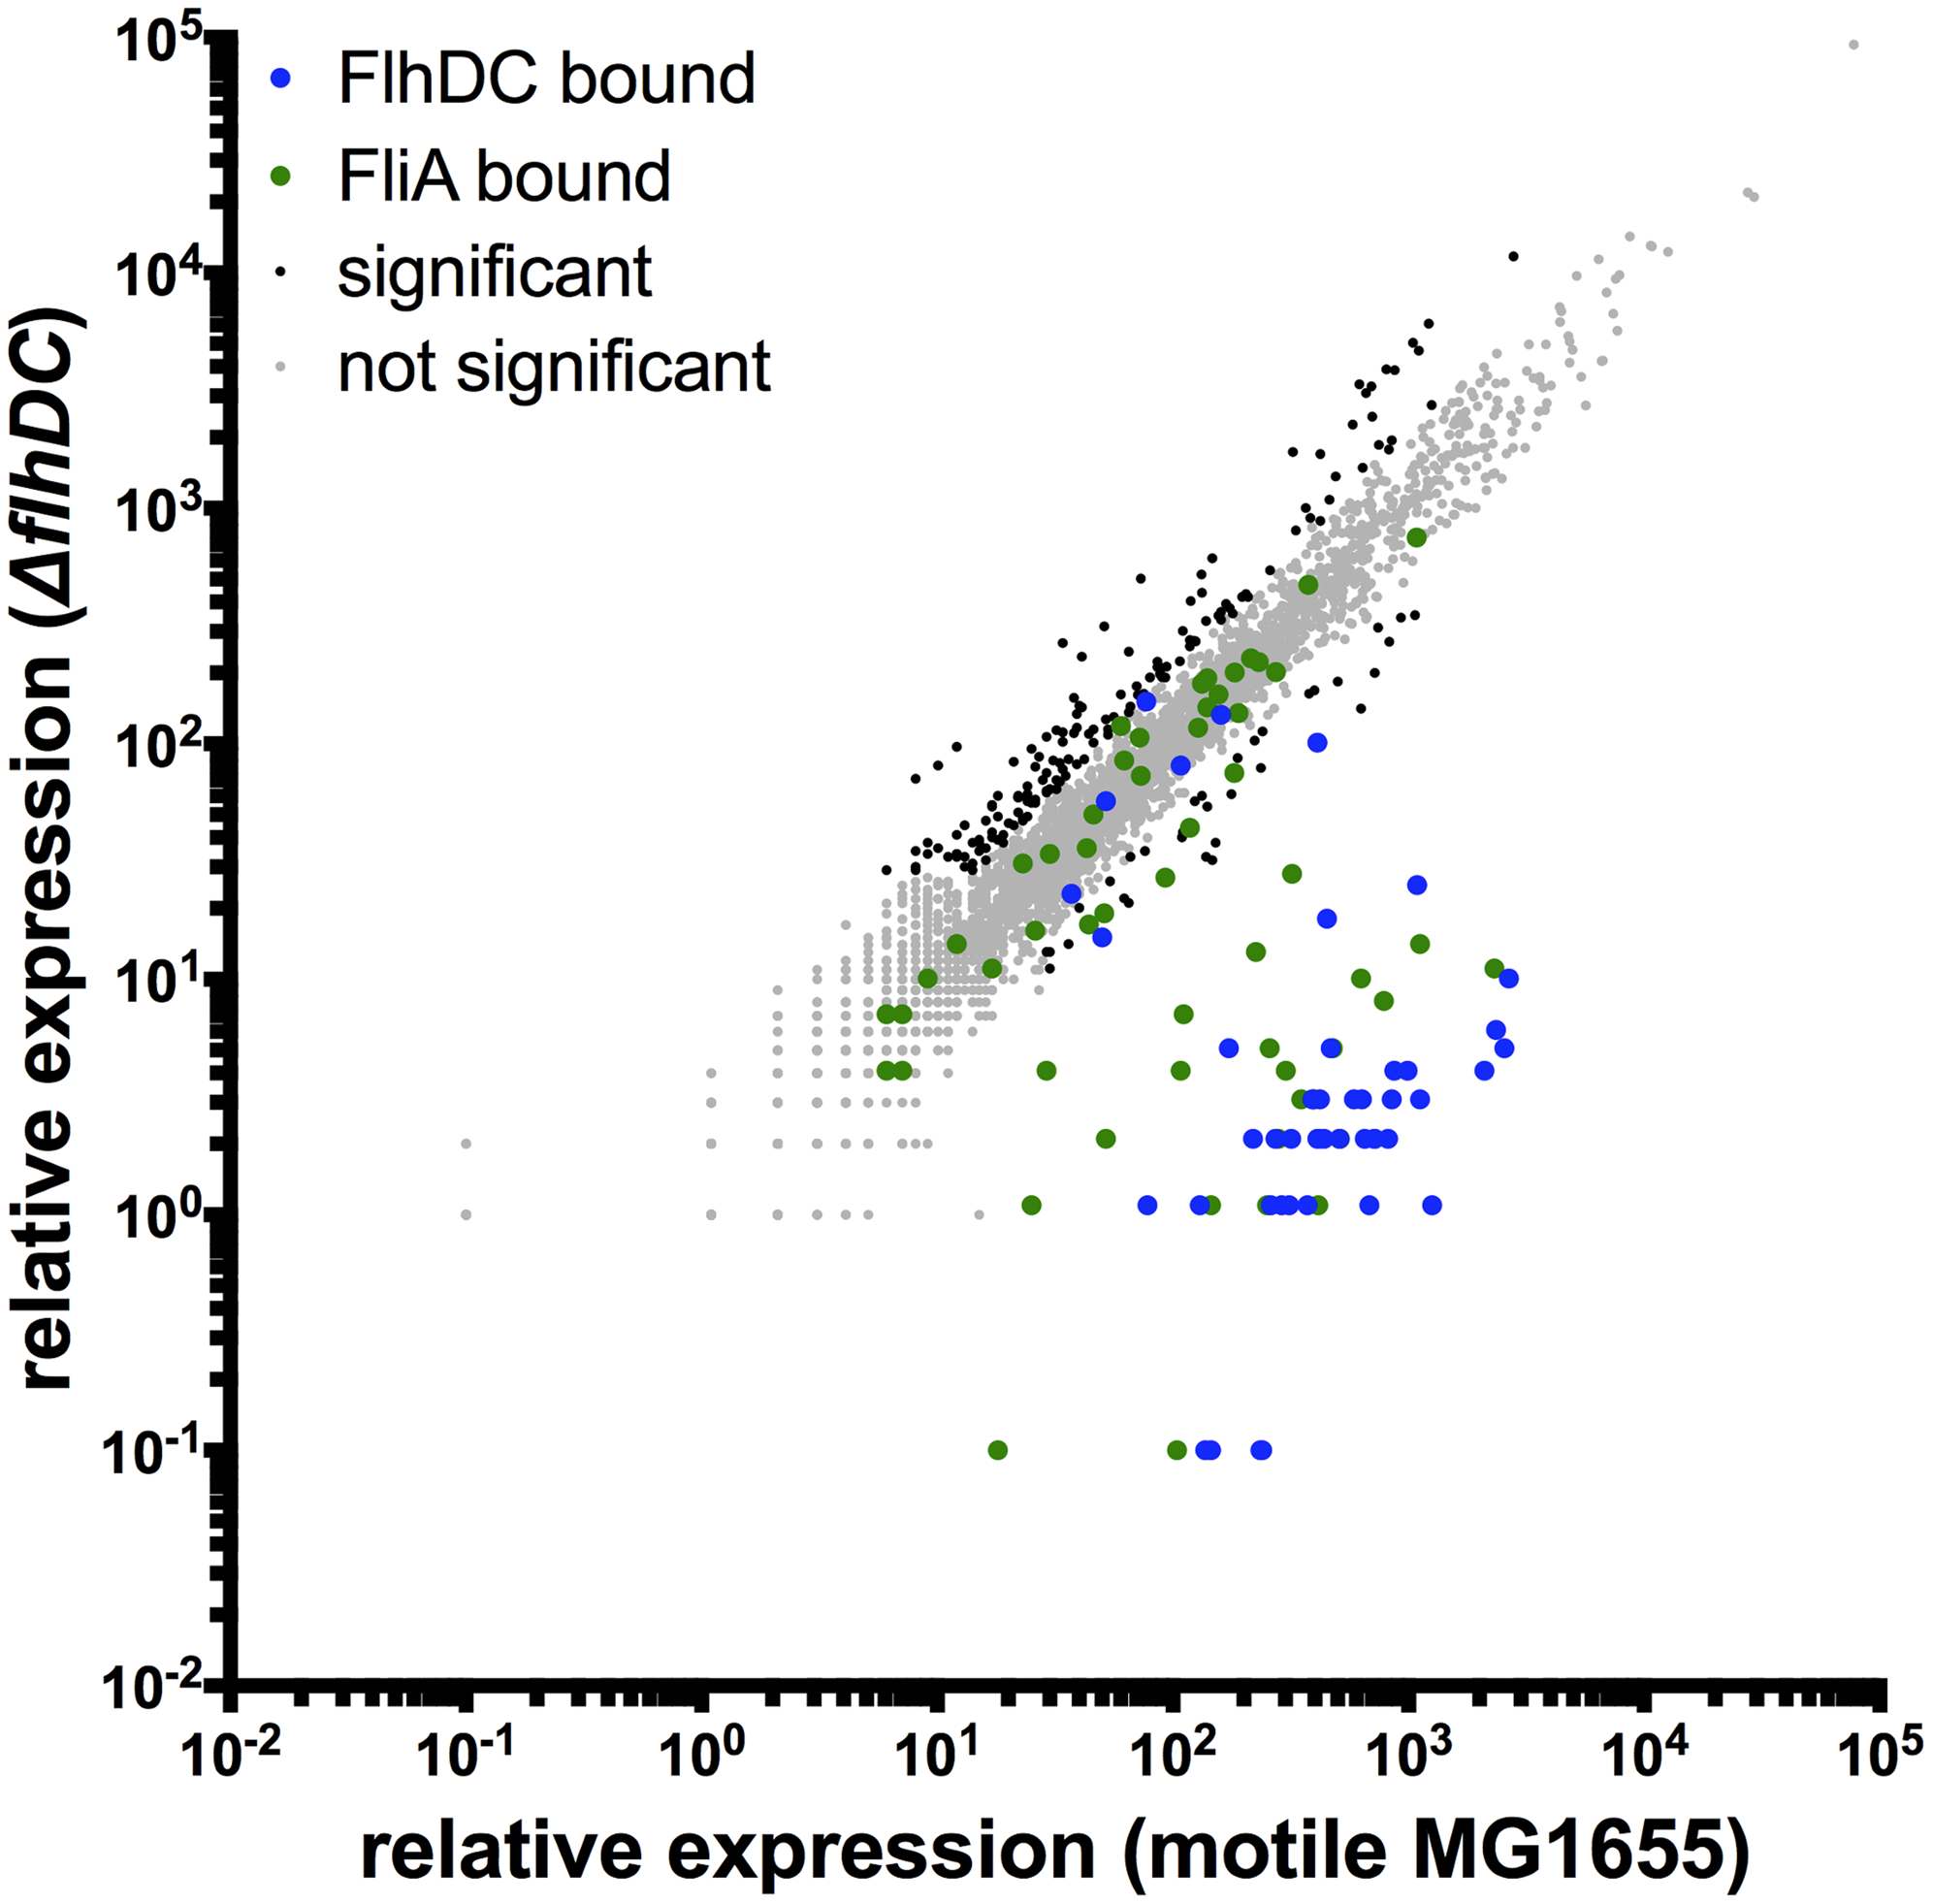 Genome-wide FlhDC-dependent gene expression.